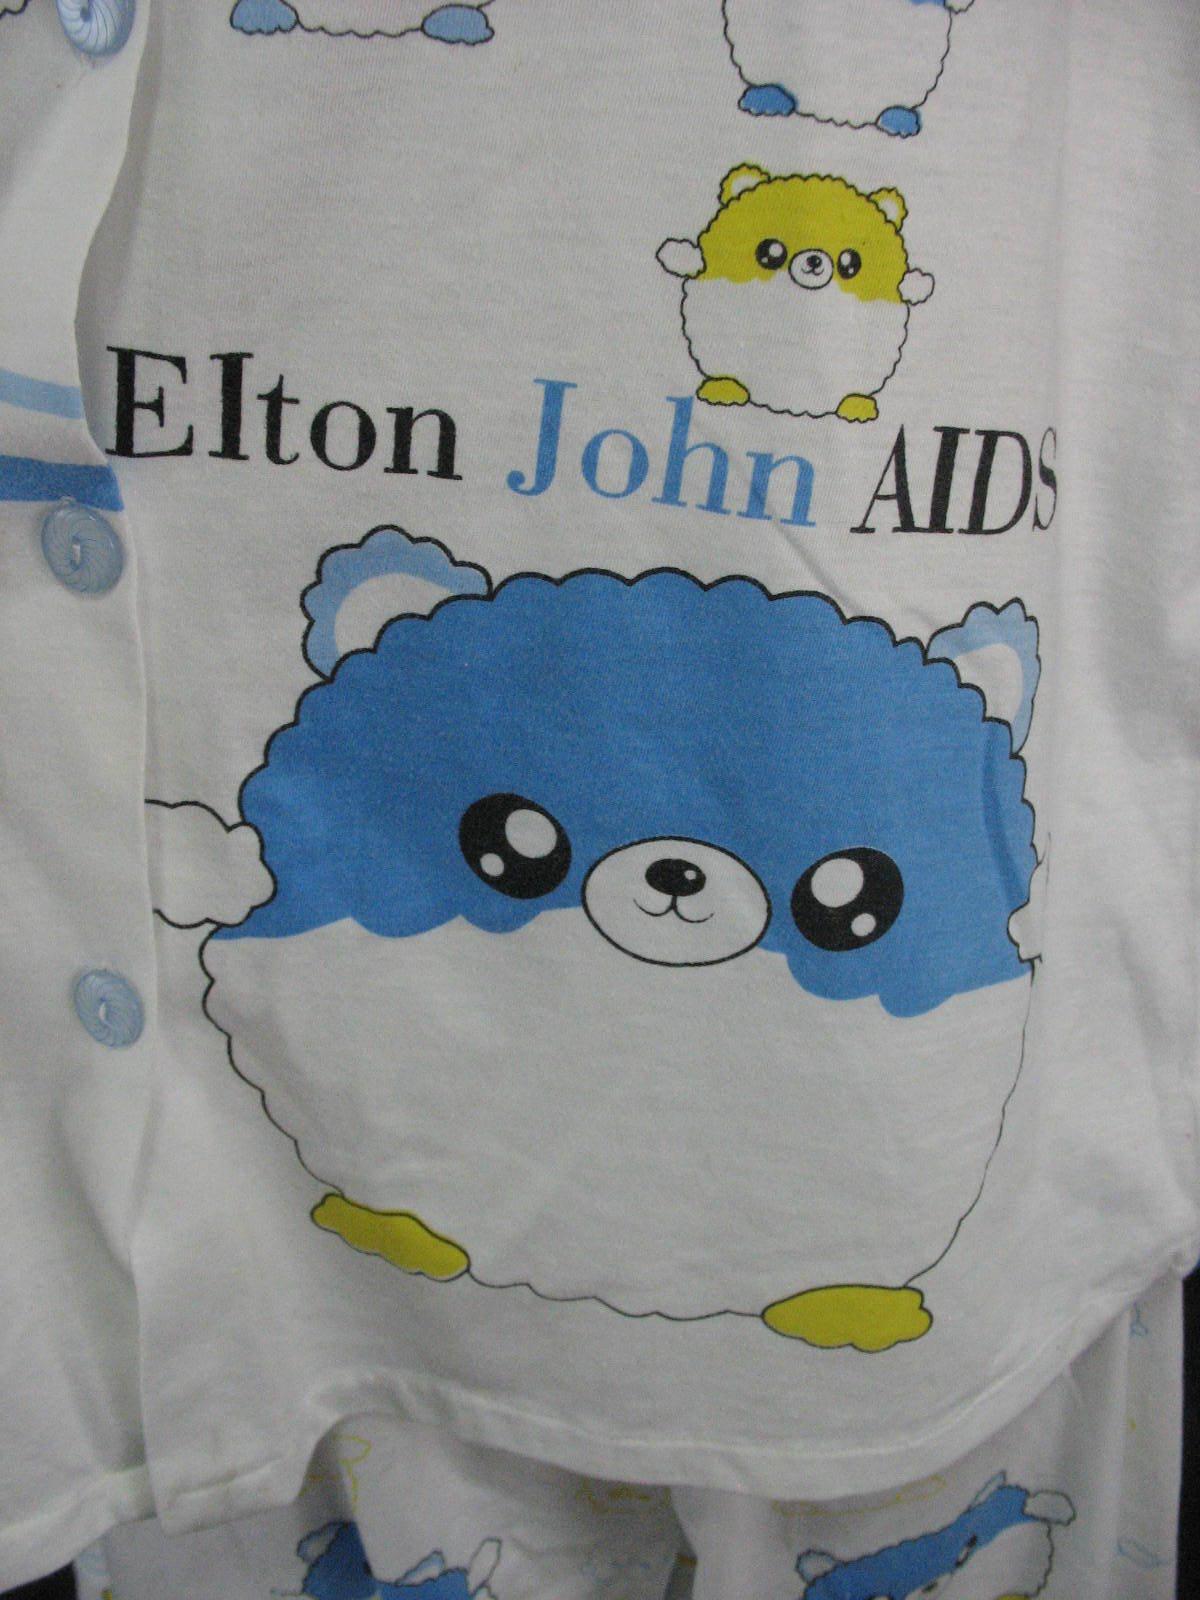 Elton John Aids Foundation Pajamas Small Cute Baby doll Two Piece image 3